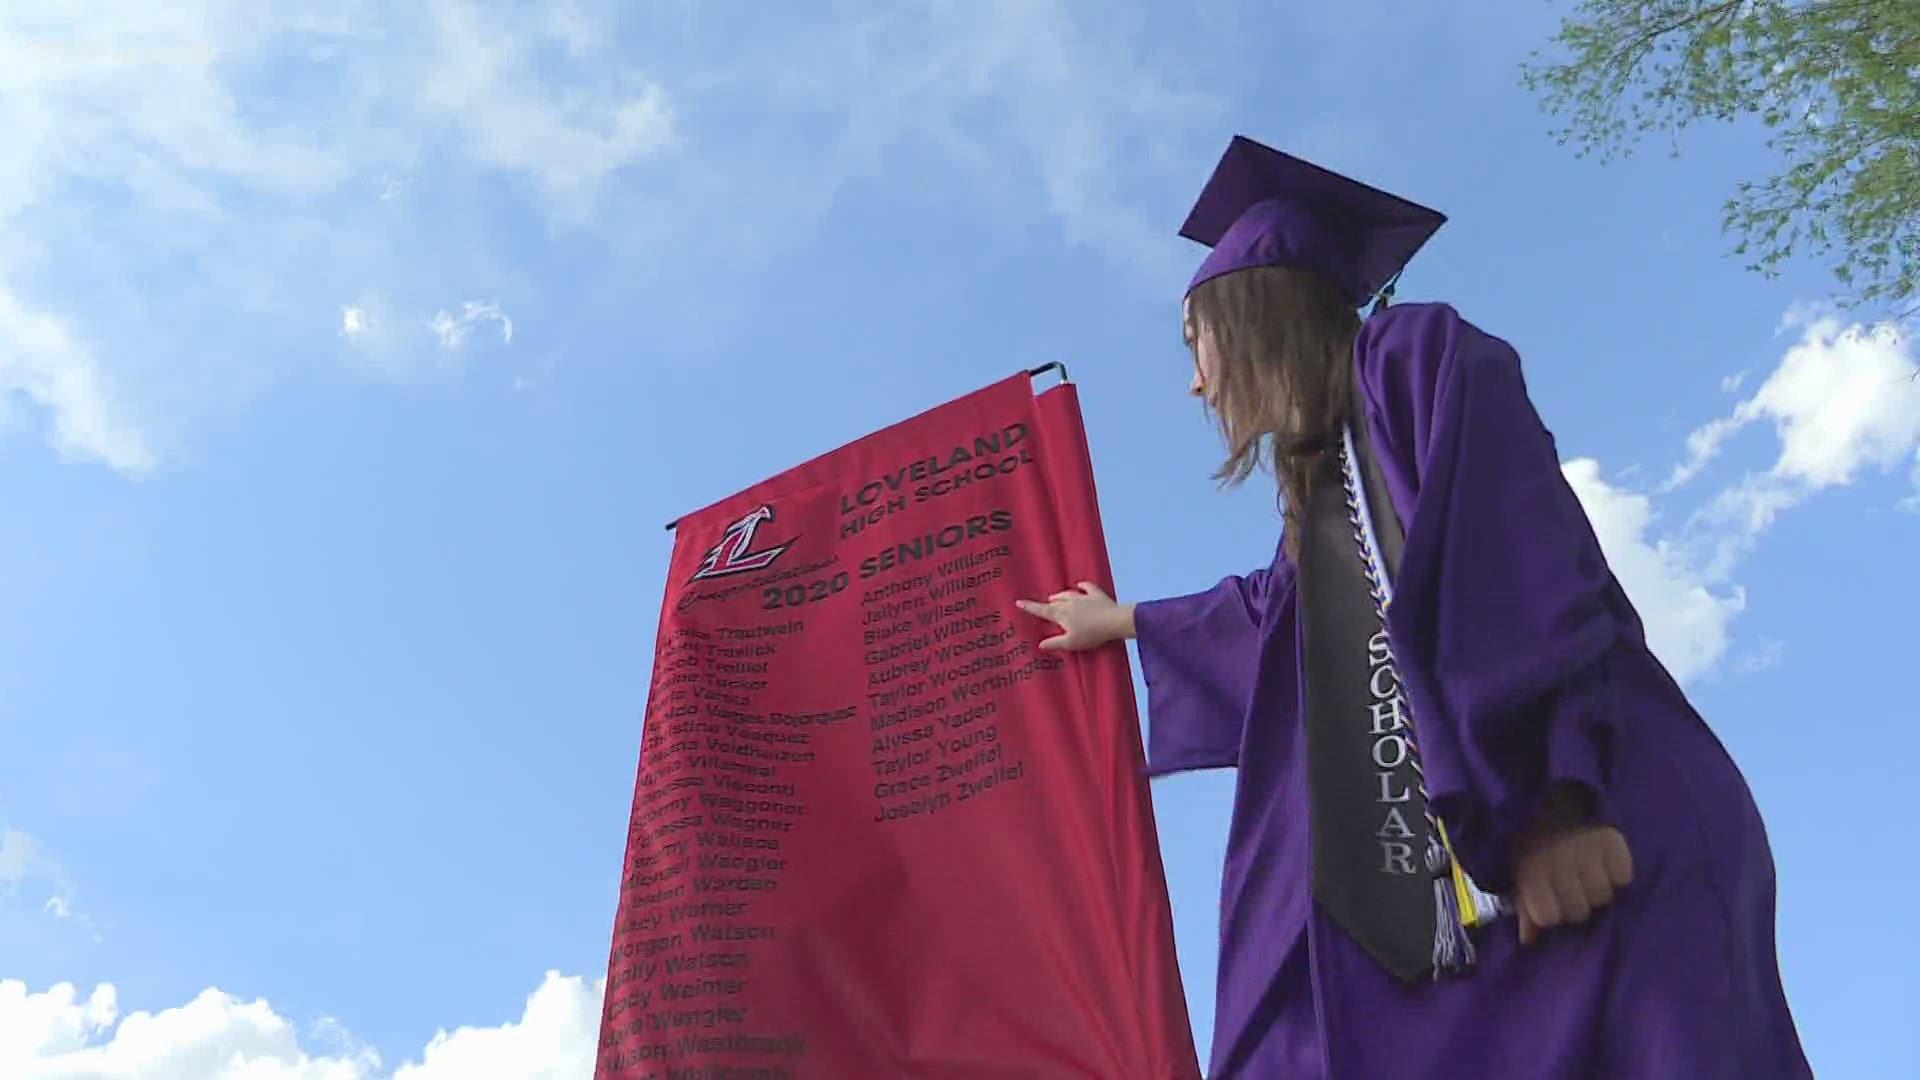 Loveland Halloween 2020 Rescheduled Graduate Walk of Honor' honors seniors in Loveland